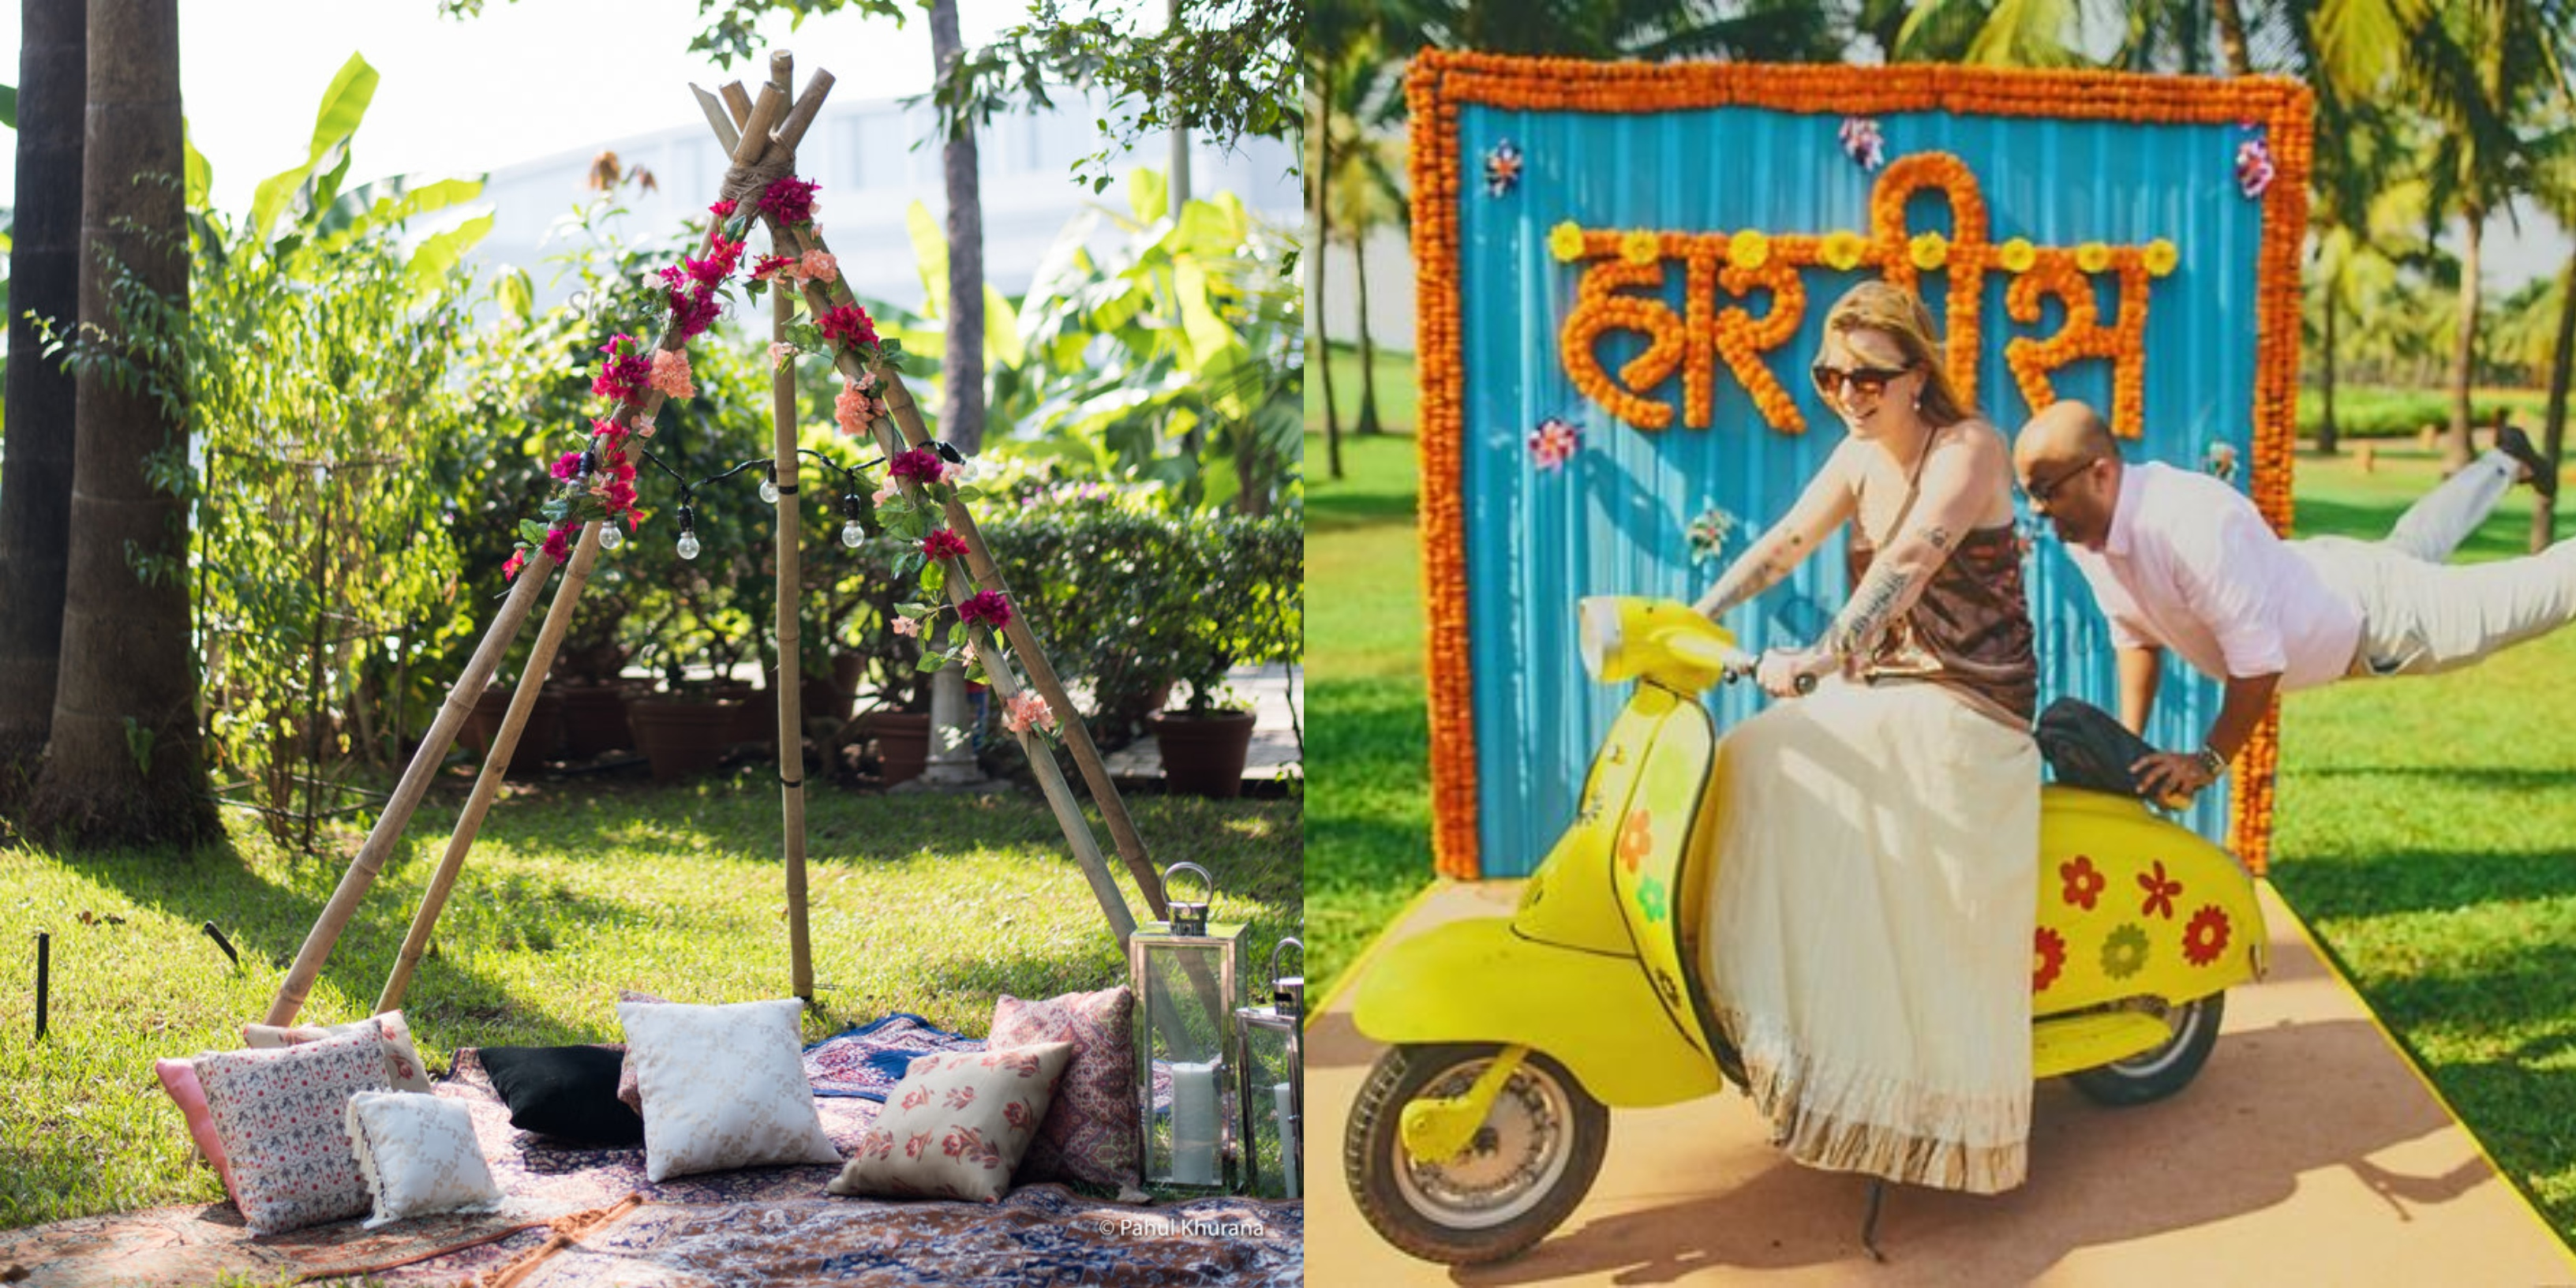 17 Trending Photobooth Ideas For Your Backyard To Terrace Intimate Wedding Shaadisaga